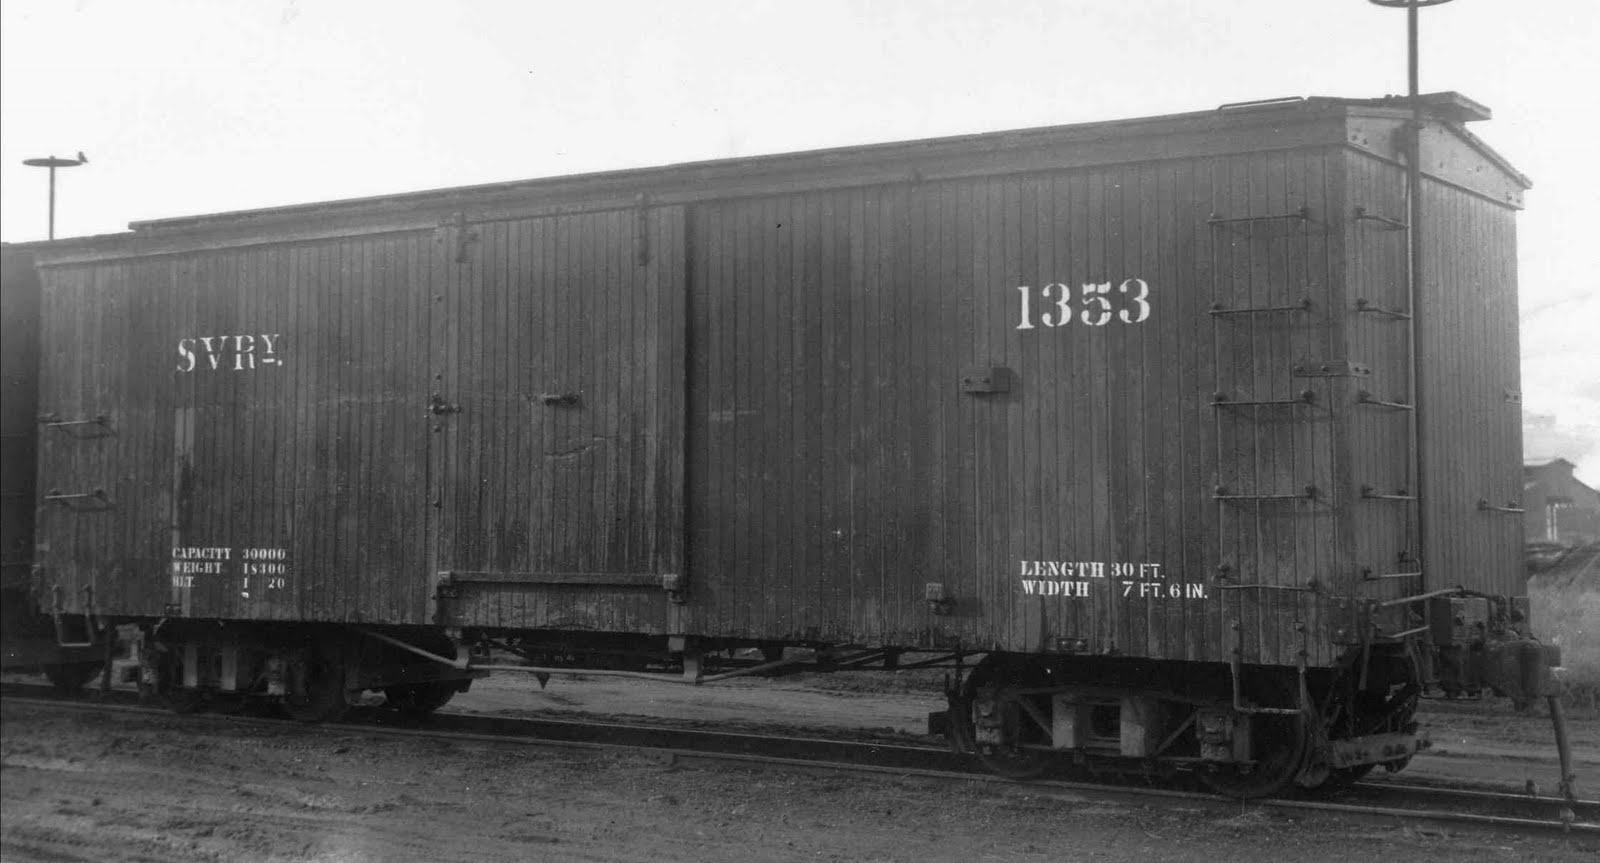 Boxcar 1353, Historic Image.